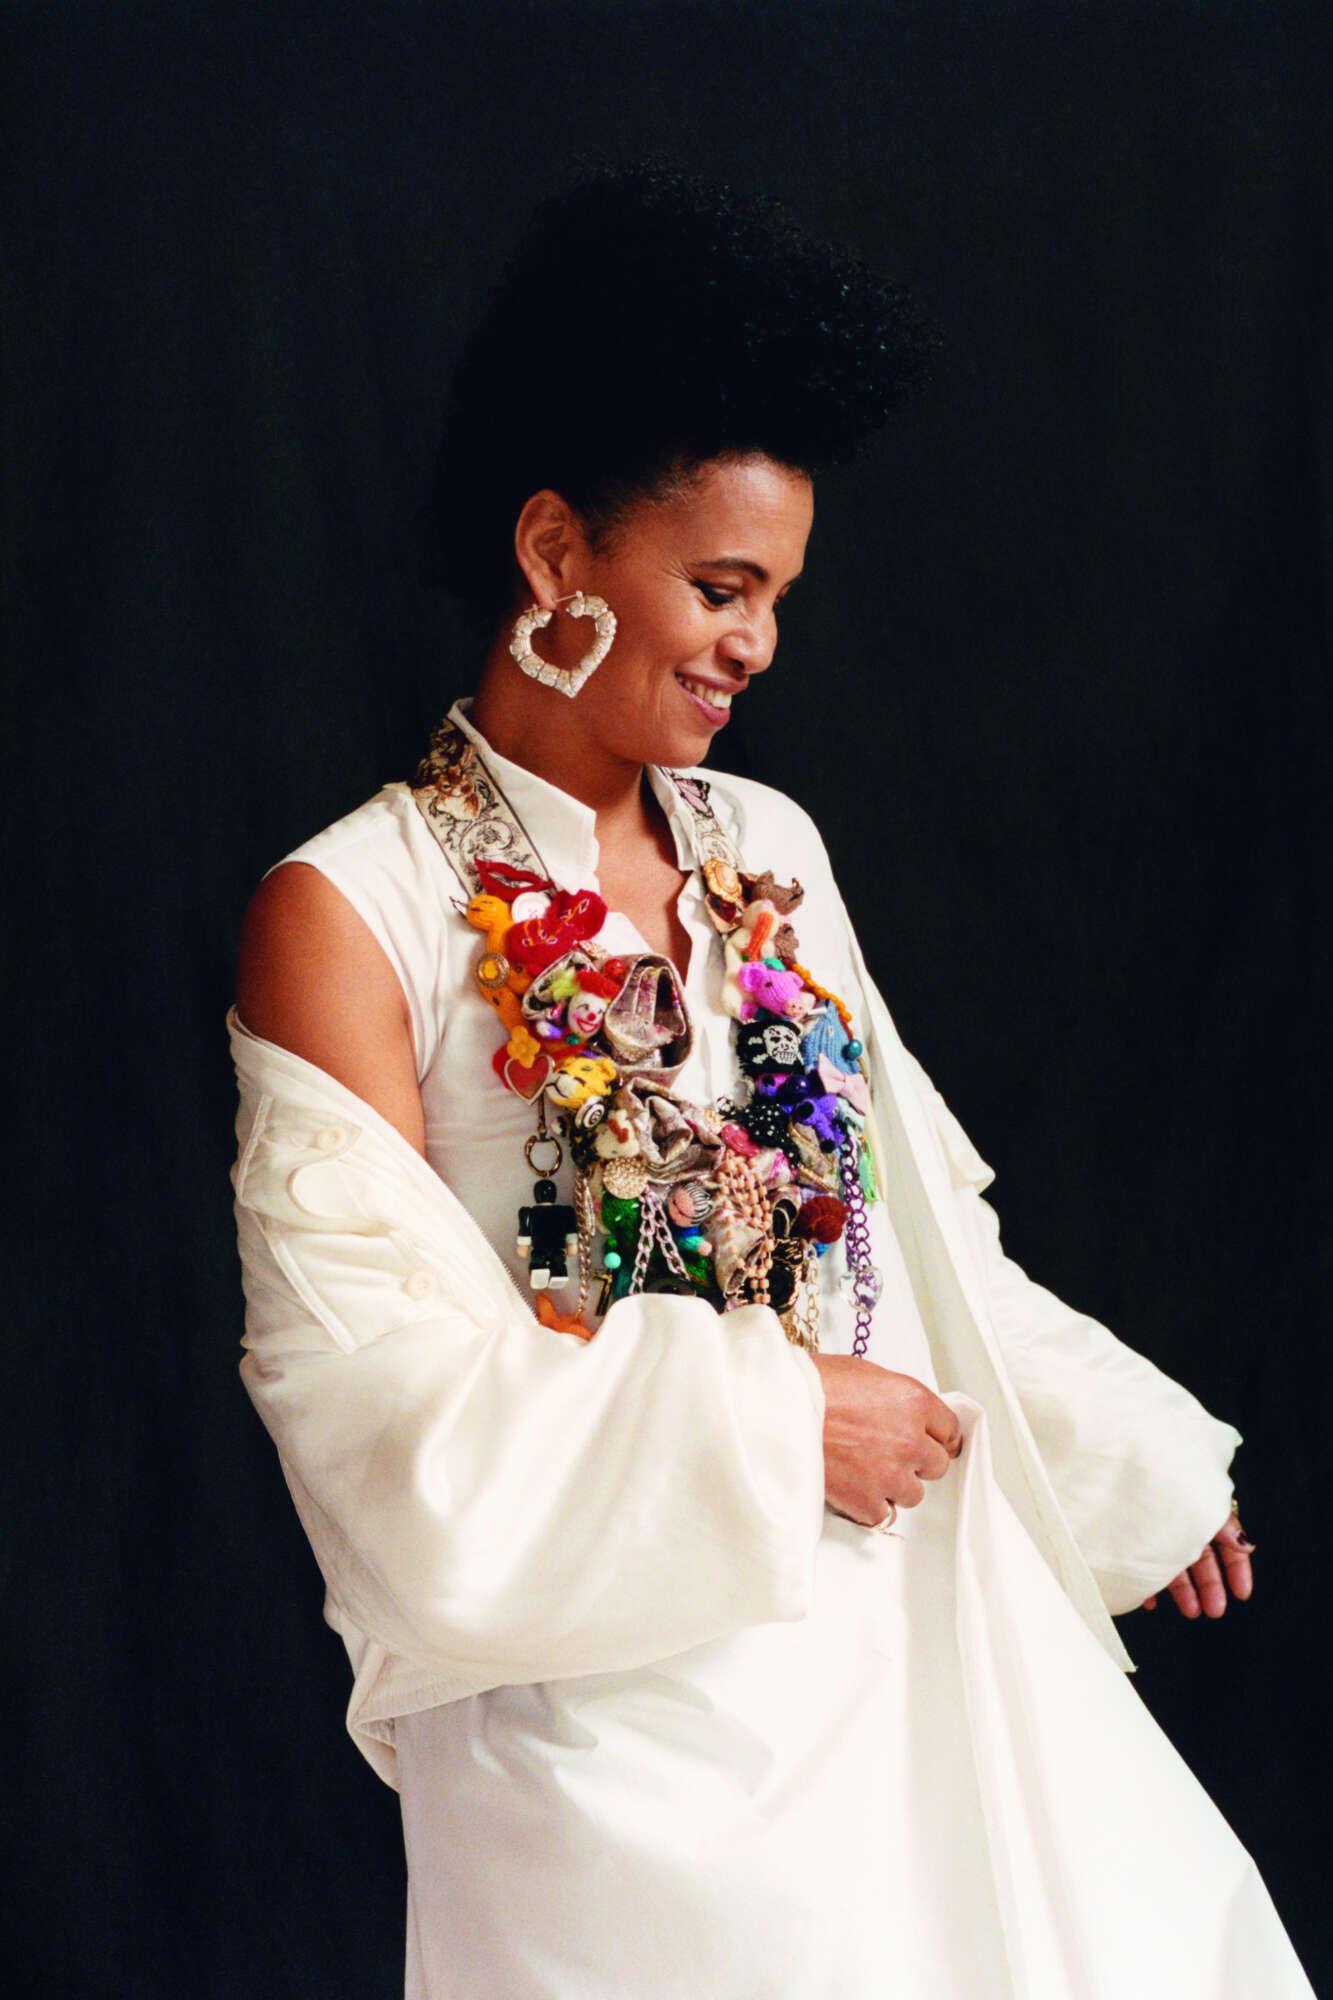 NENEH wears MM6 dress from MACHINE-A, KATHARINE HAMNETT jacket, JUDY BLAME necklace.